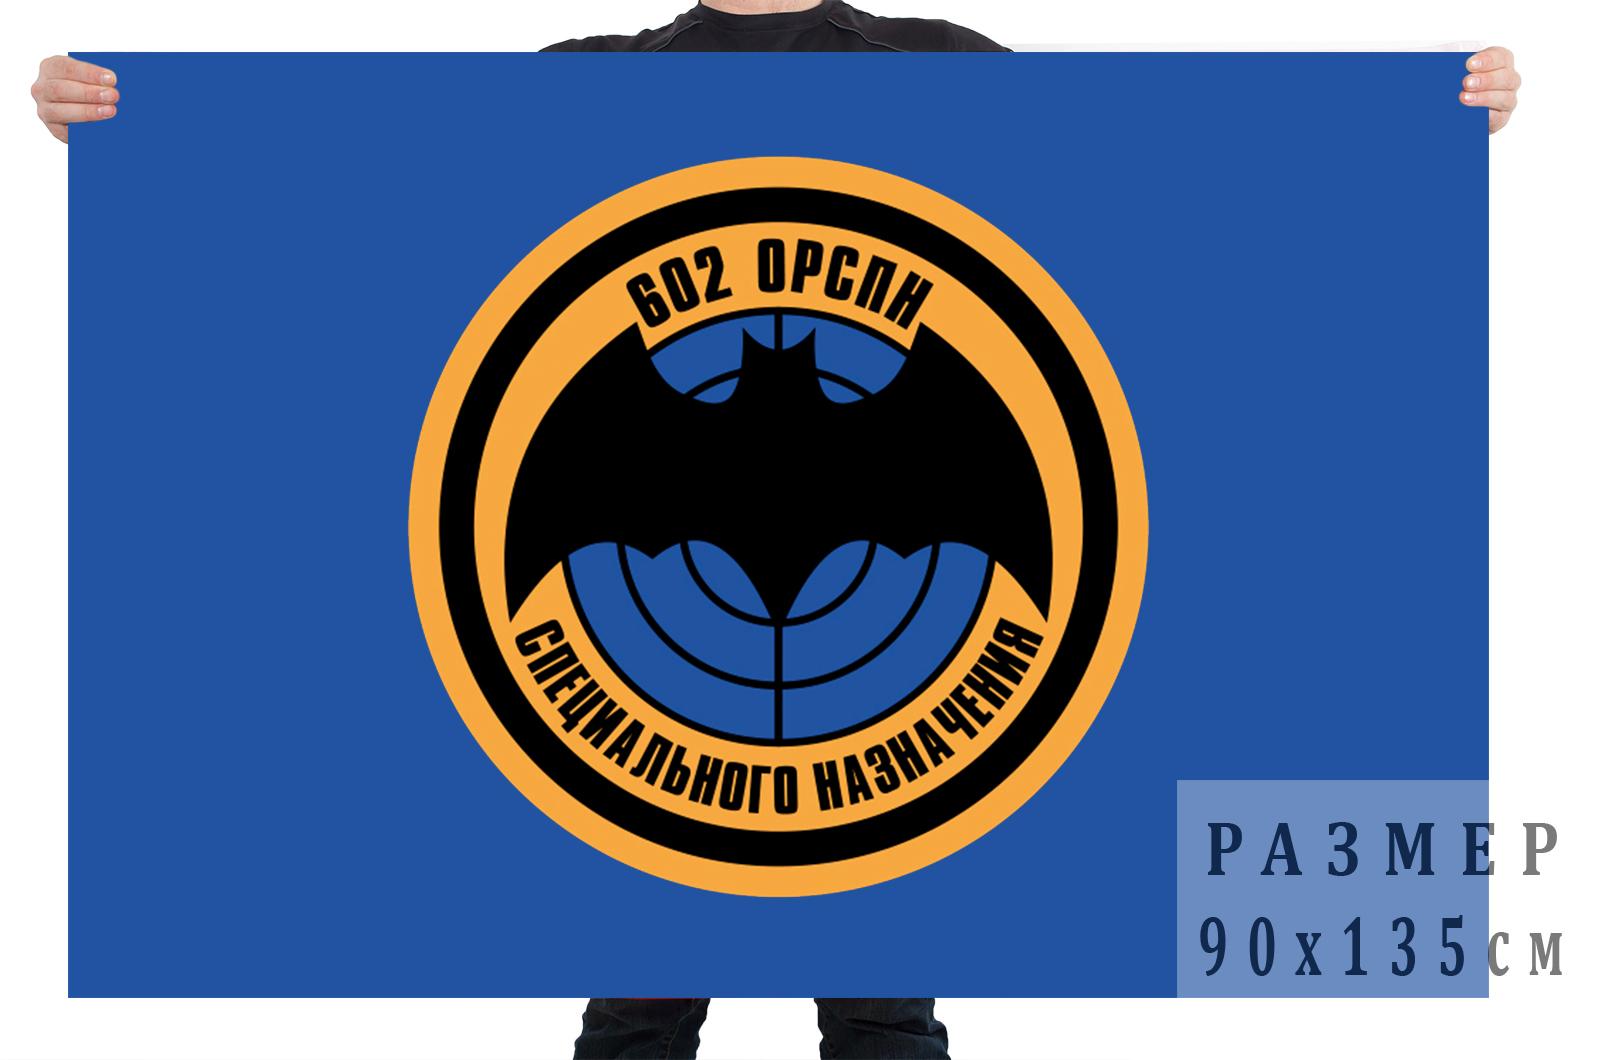 Флаг 602 ОРСпН спецназа ГРУ